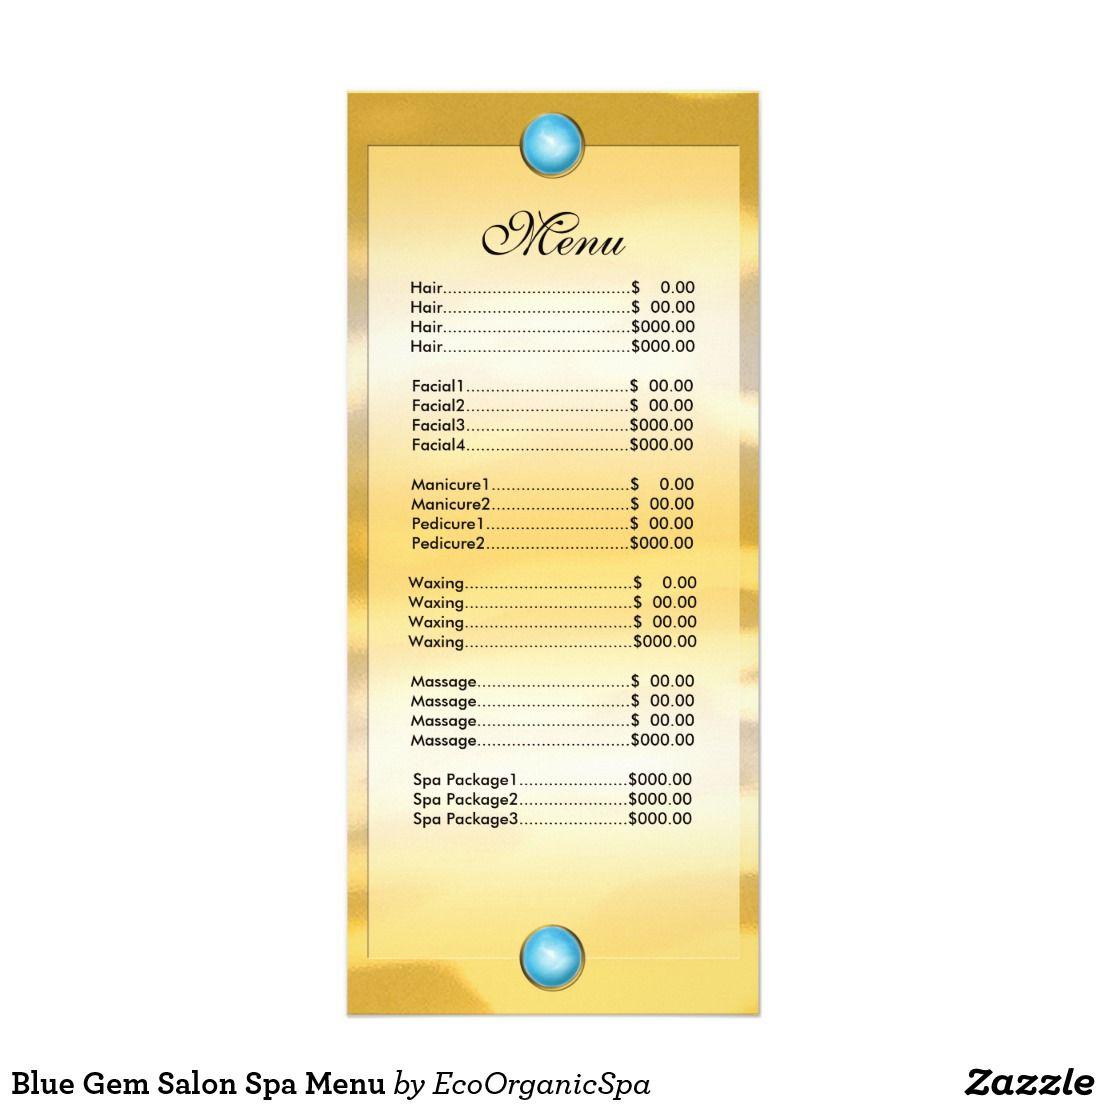 Blue Gem Salon Spa Menu Spa menu, Gem salon, Spa prices